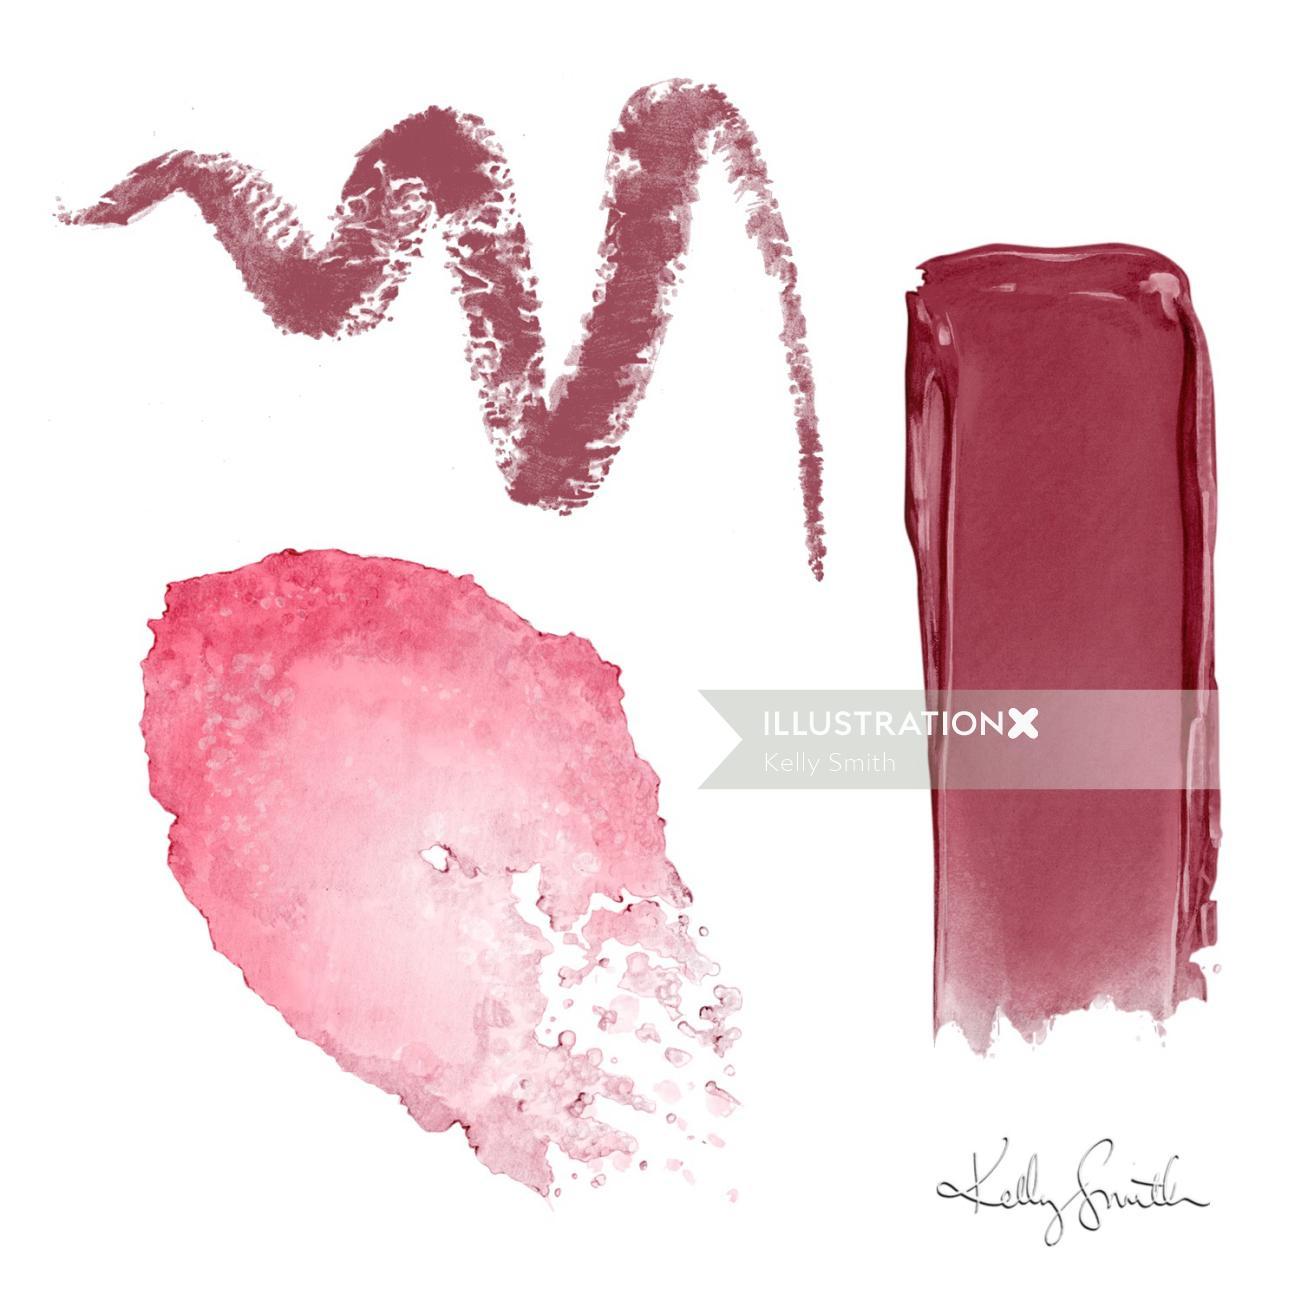 Digital painting of Lip Smears